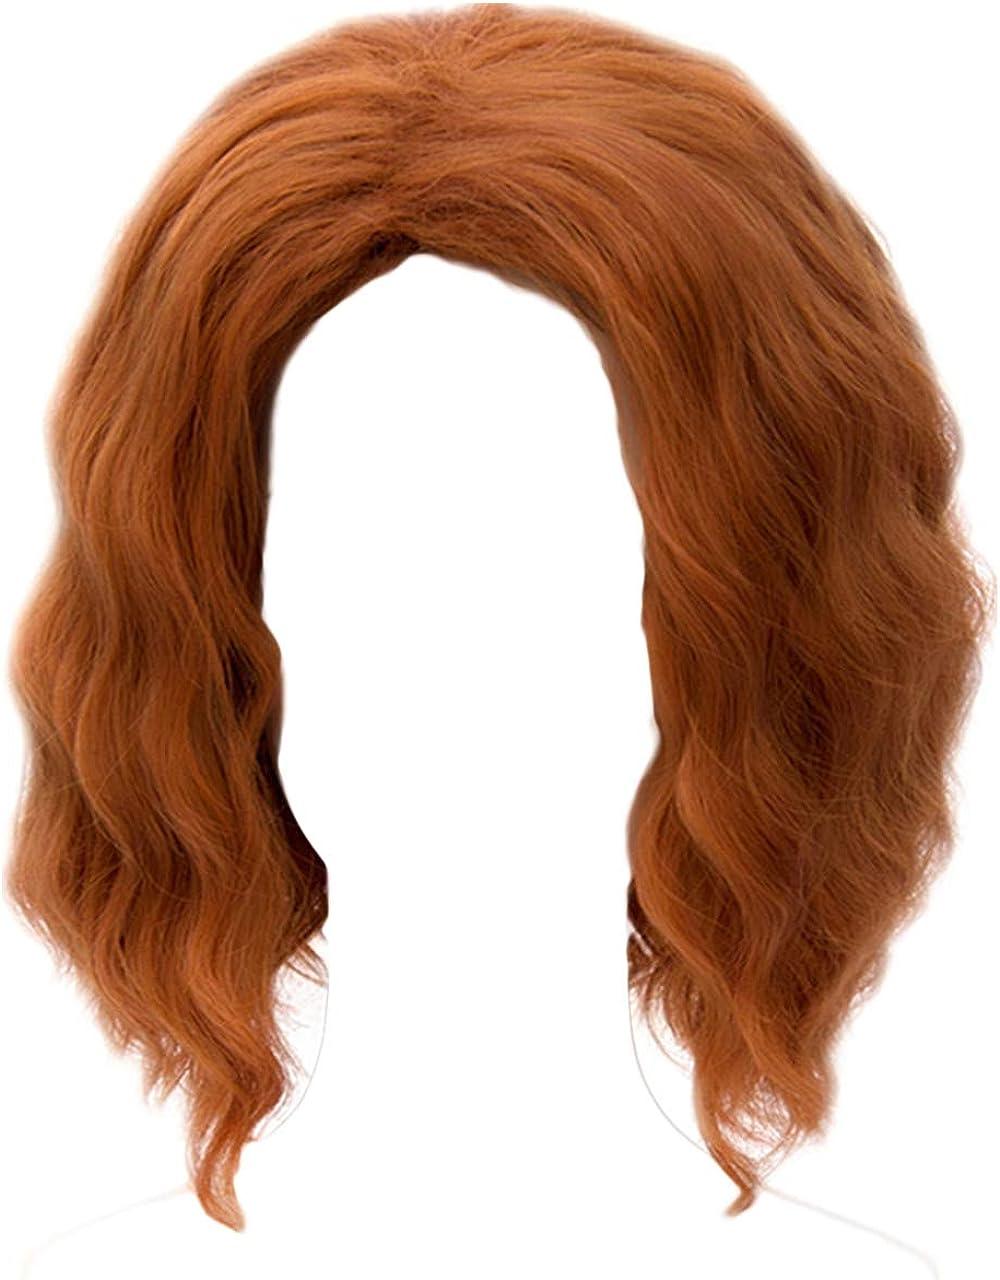 Curly Hair Cosplay Wig 30CM Dark Orange Anime for The Avengers Black Widow Short